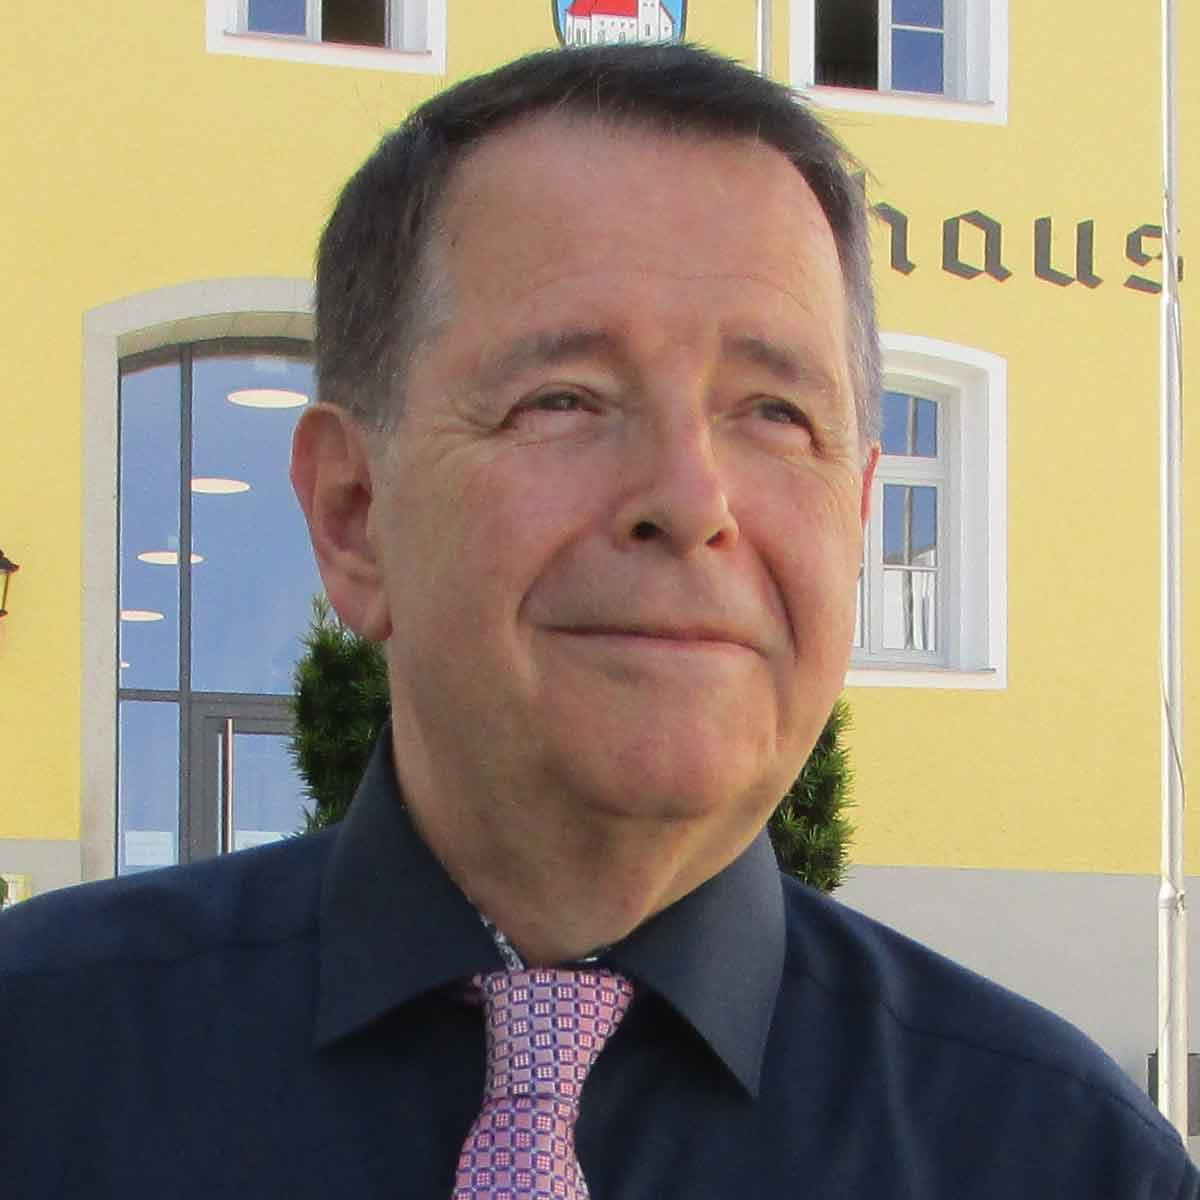 Dr. Herbert Tekles Diplom-Soziologe